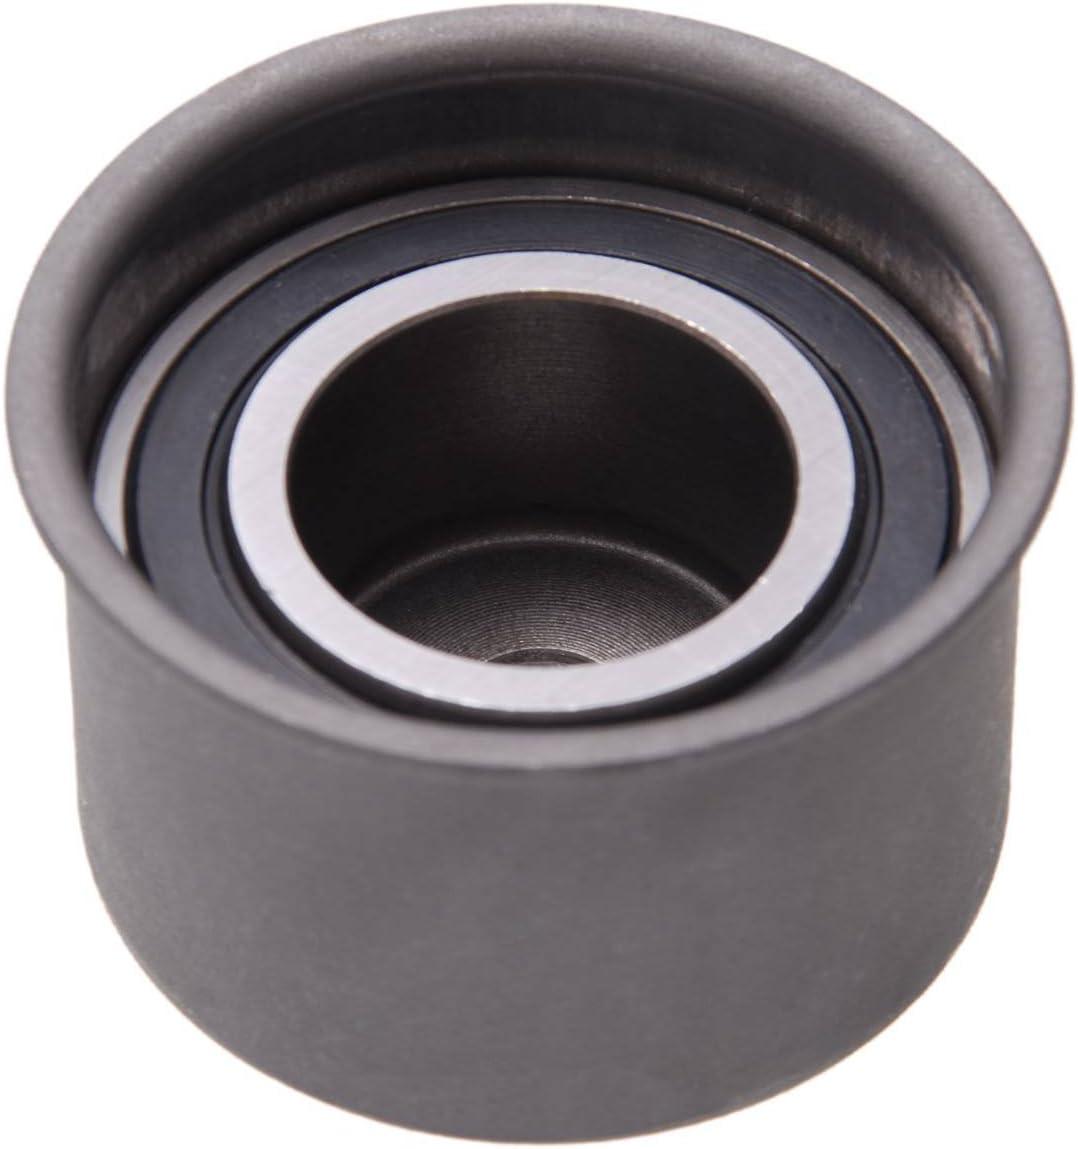 Pulley Idler Timing Belt Oem MD319022 Max 61% OFF Febest Choice 0488-V97W